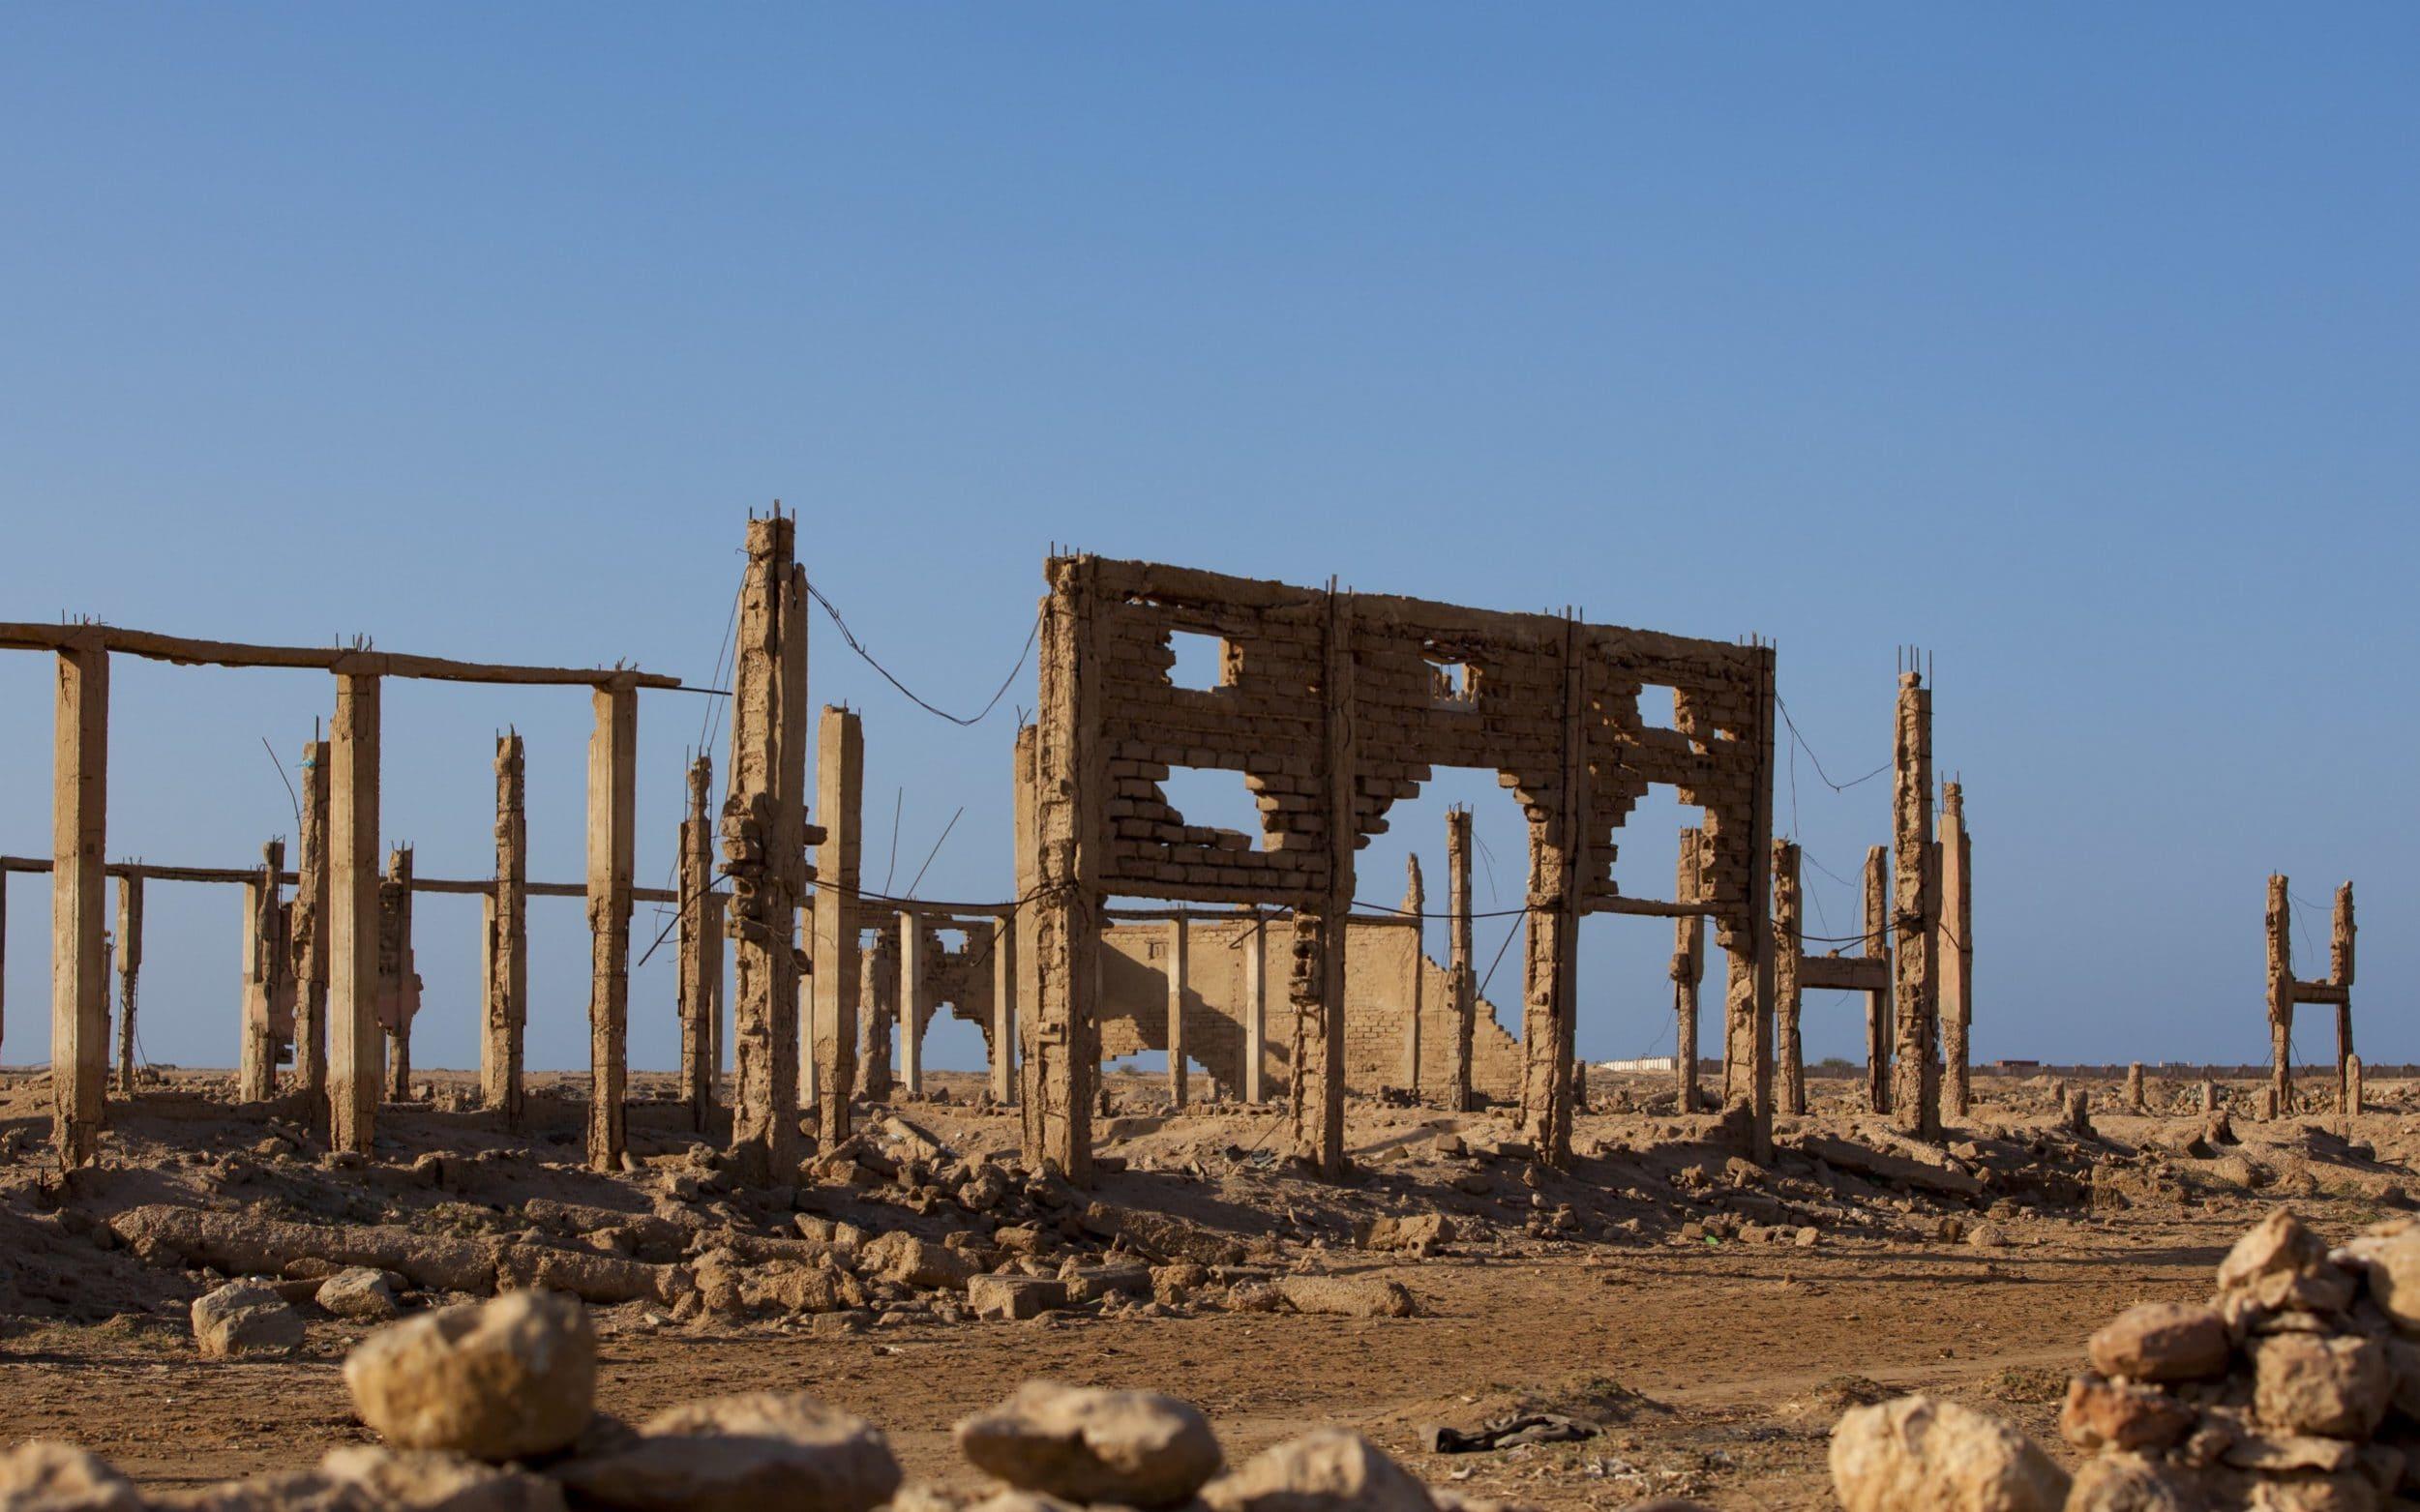 Ruins of building destroyed during civil war in Berbera, Somaliland CREDIT: GAMMA-RAPHO